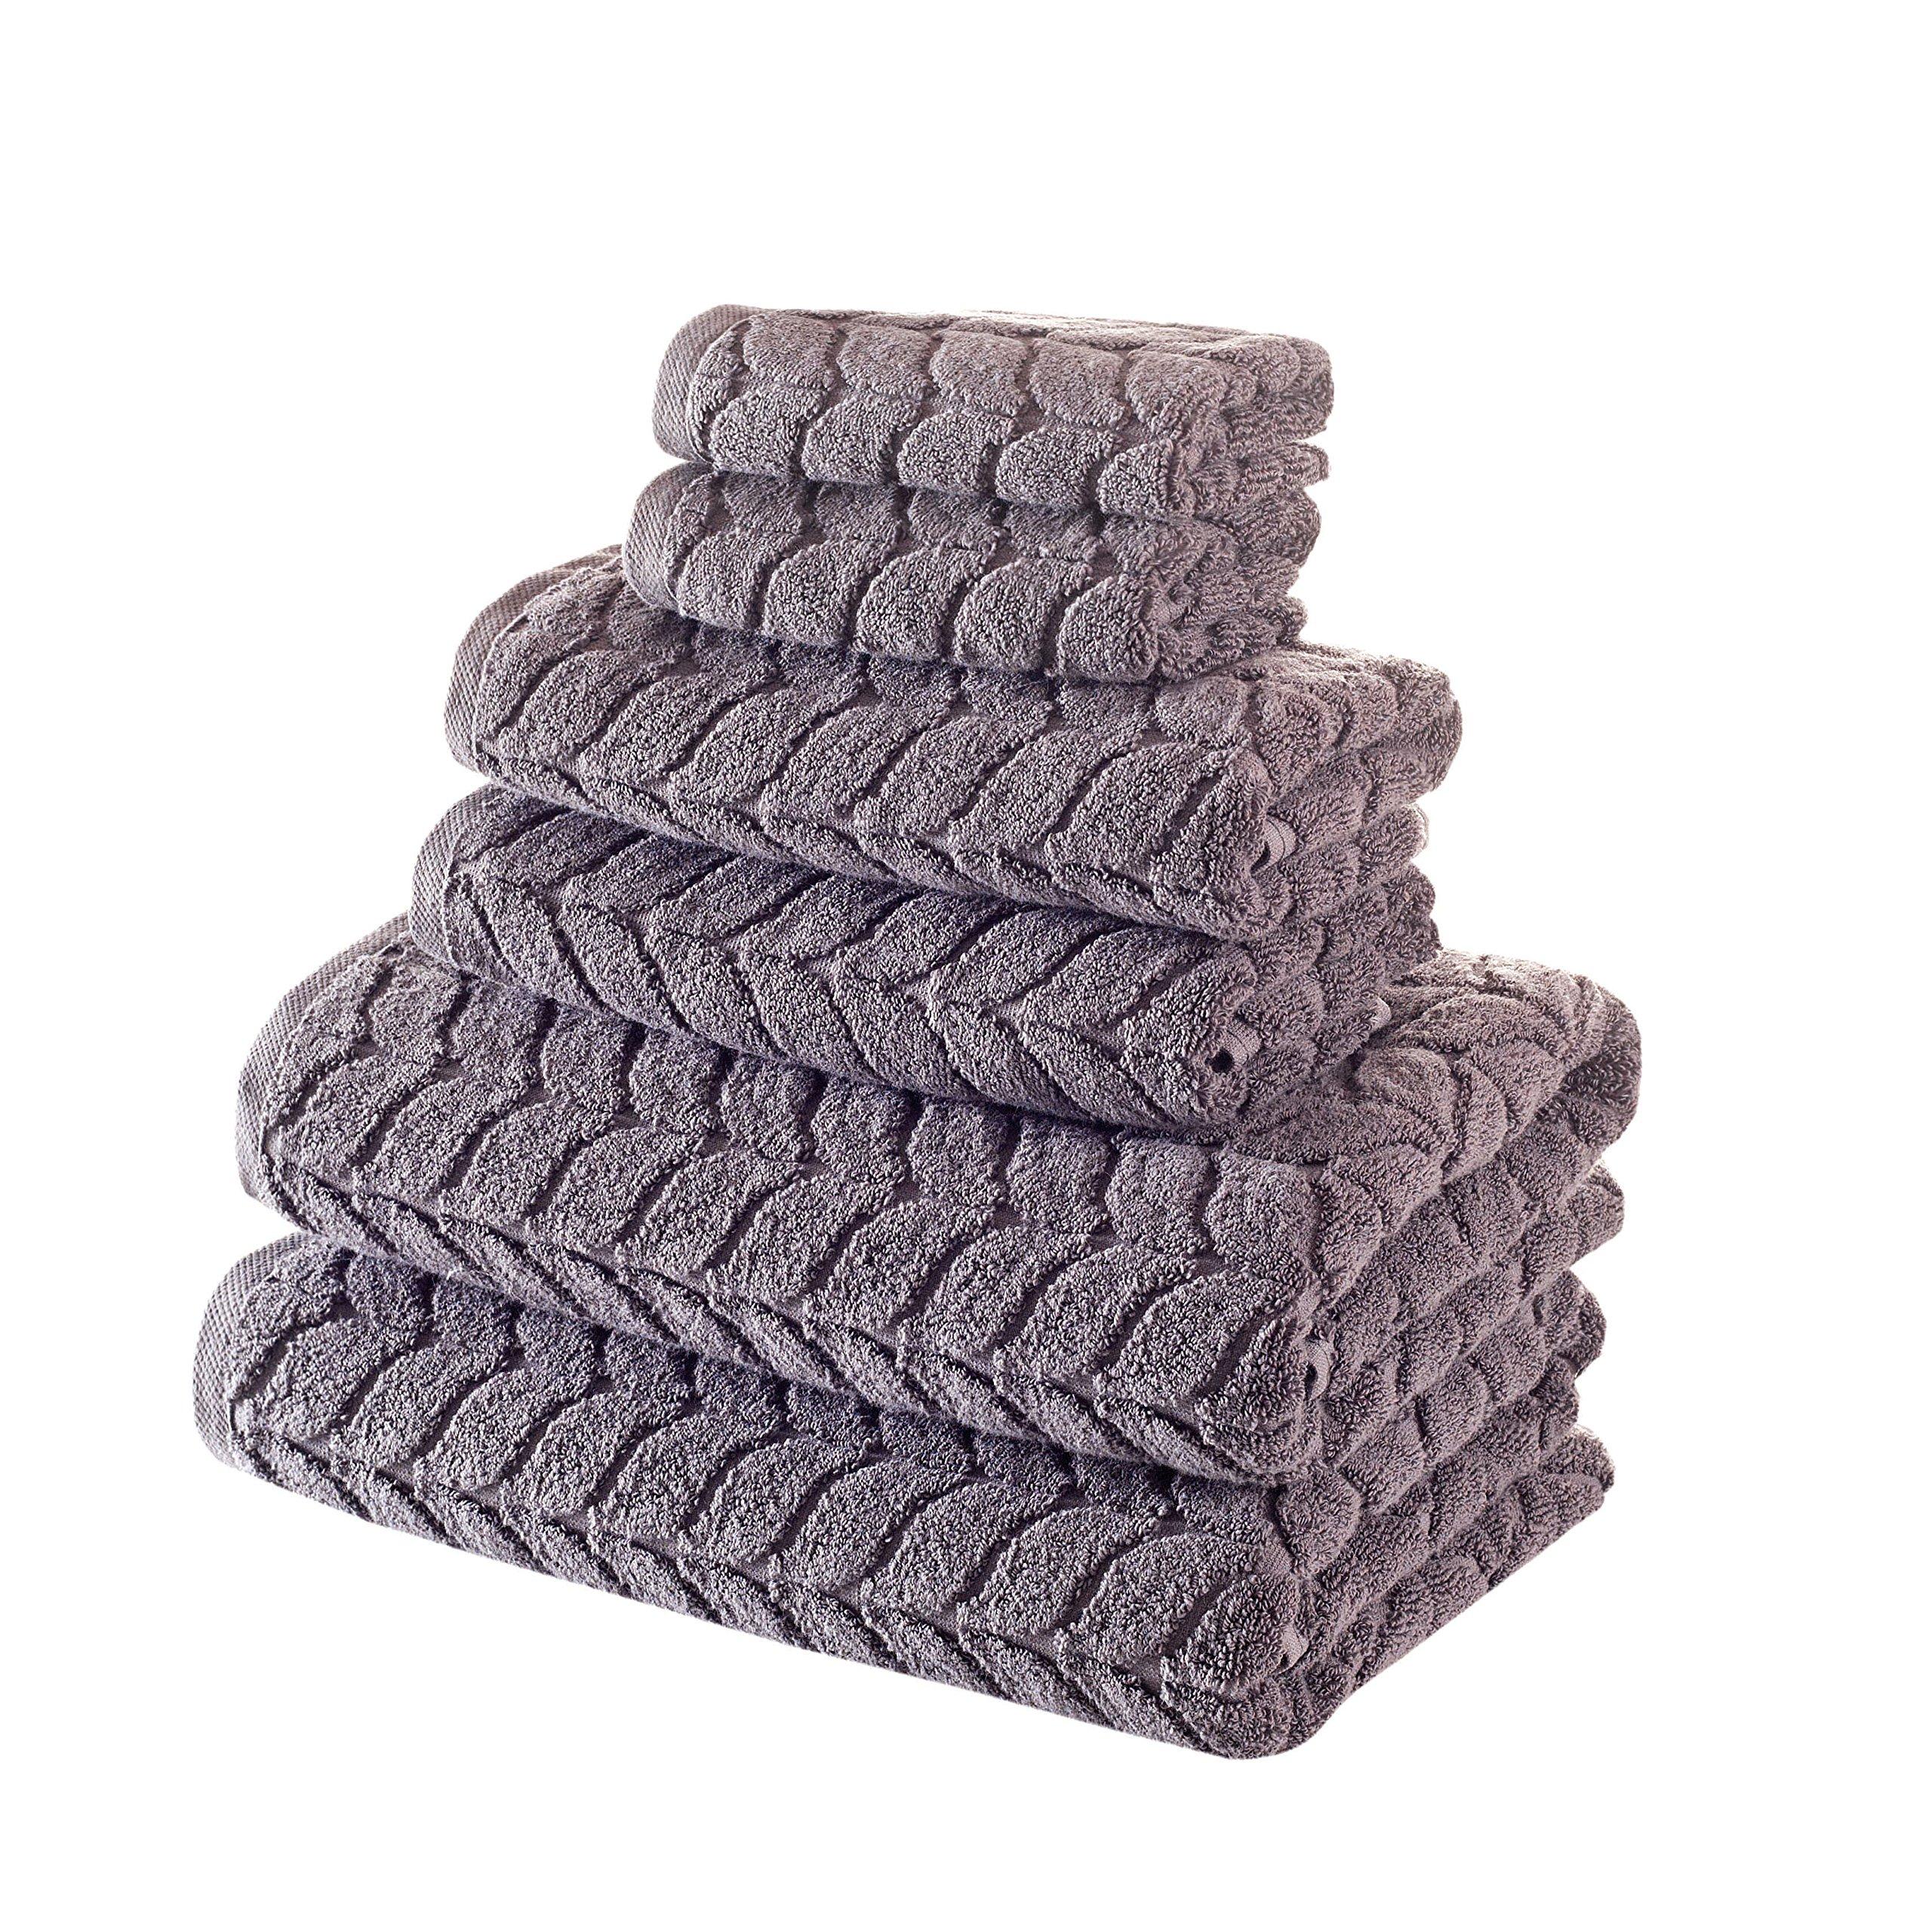 Bagno Milano 700 GSM Ultra Soft Plush Towels, Aqua Fibro Extra-Absorbent Natural, untreated GMO free Turkish Cotton (6 Pieces Towel Set, Antrasit Grey)